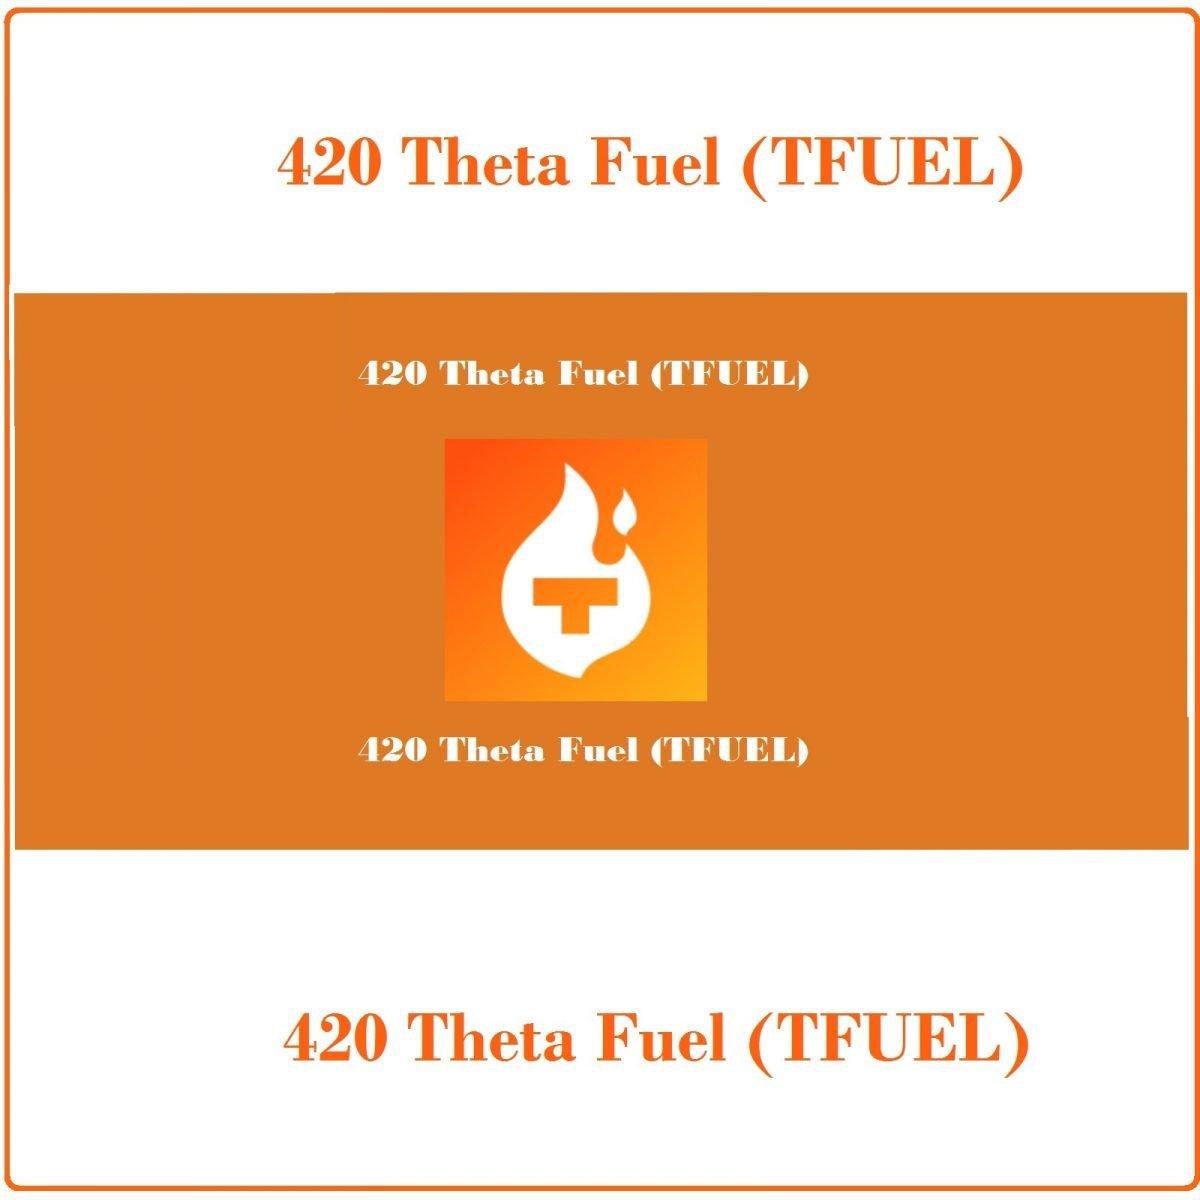 420 Theta Fuel (TFUEL)